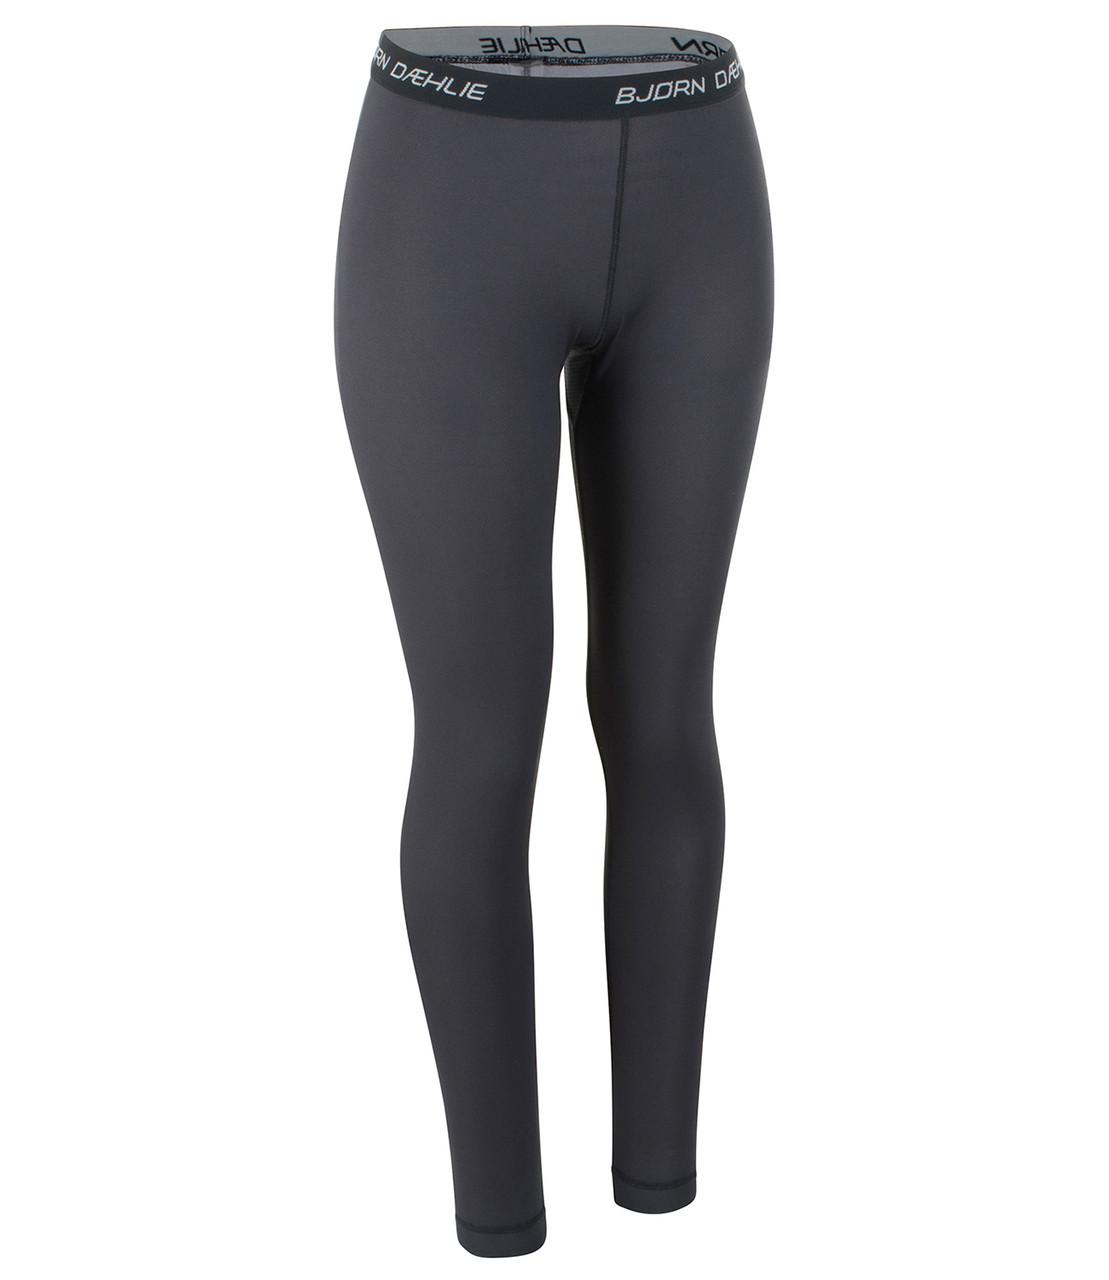 Термобелье Bjorn Daehlie Pants Dry (Women) 320901 96100